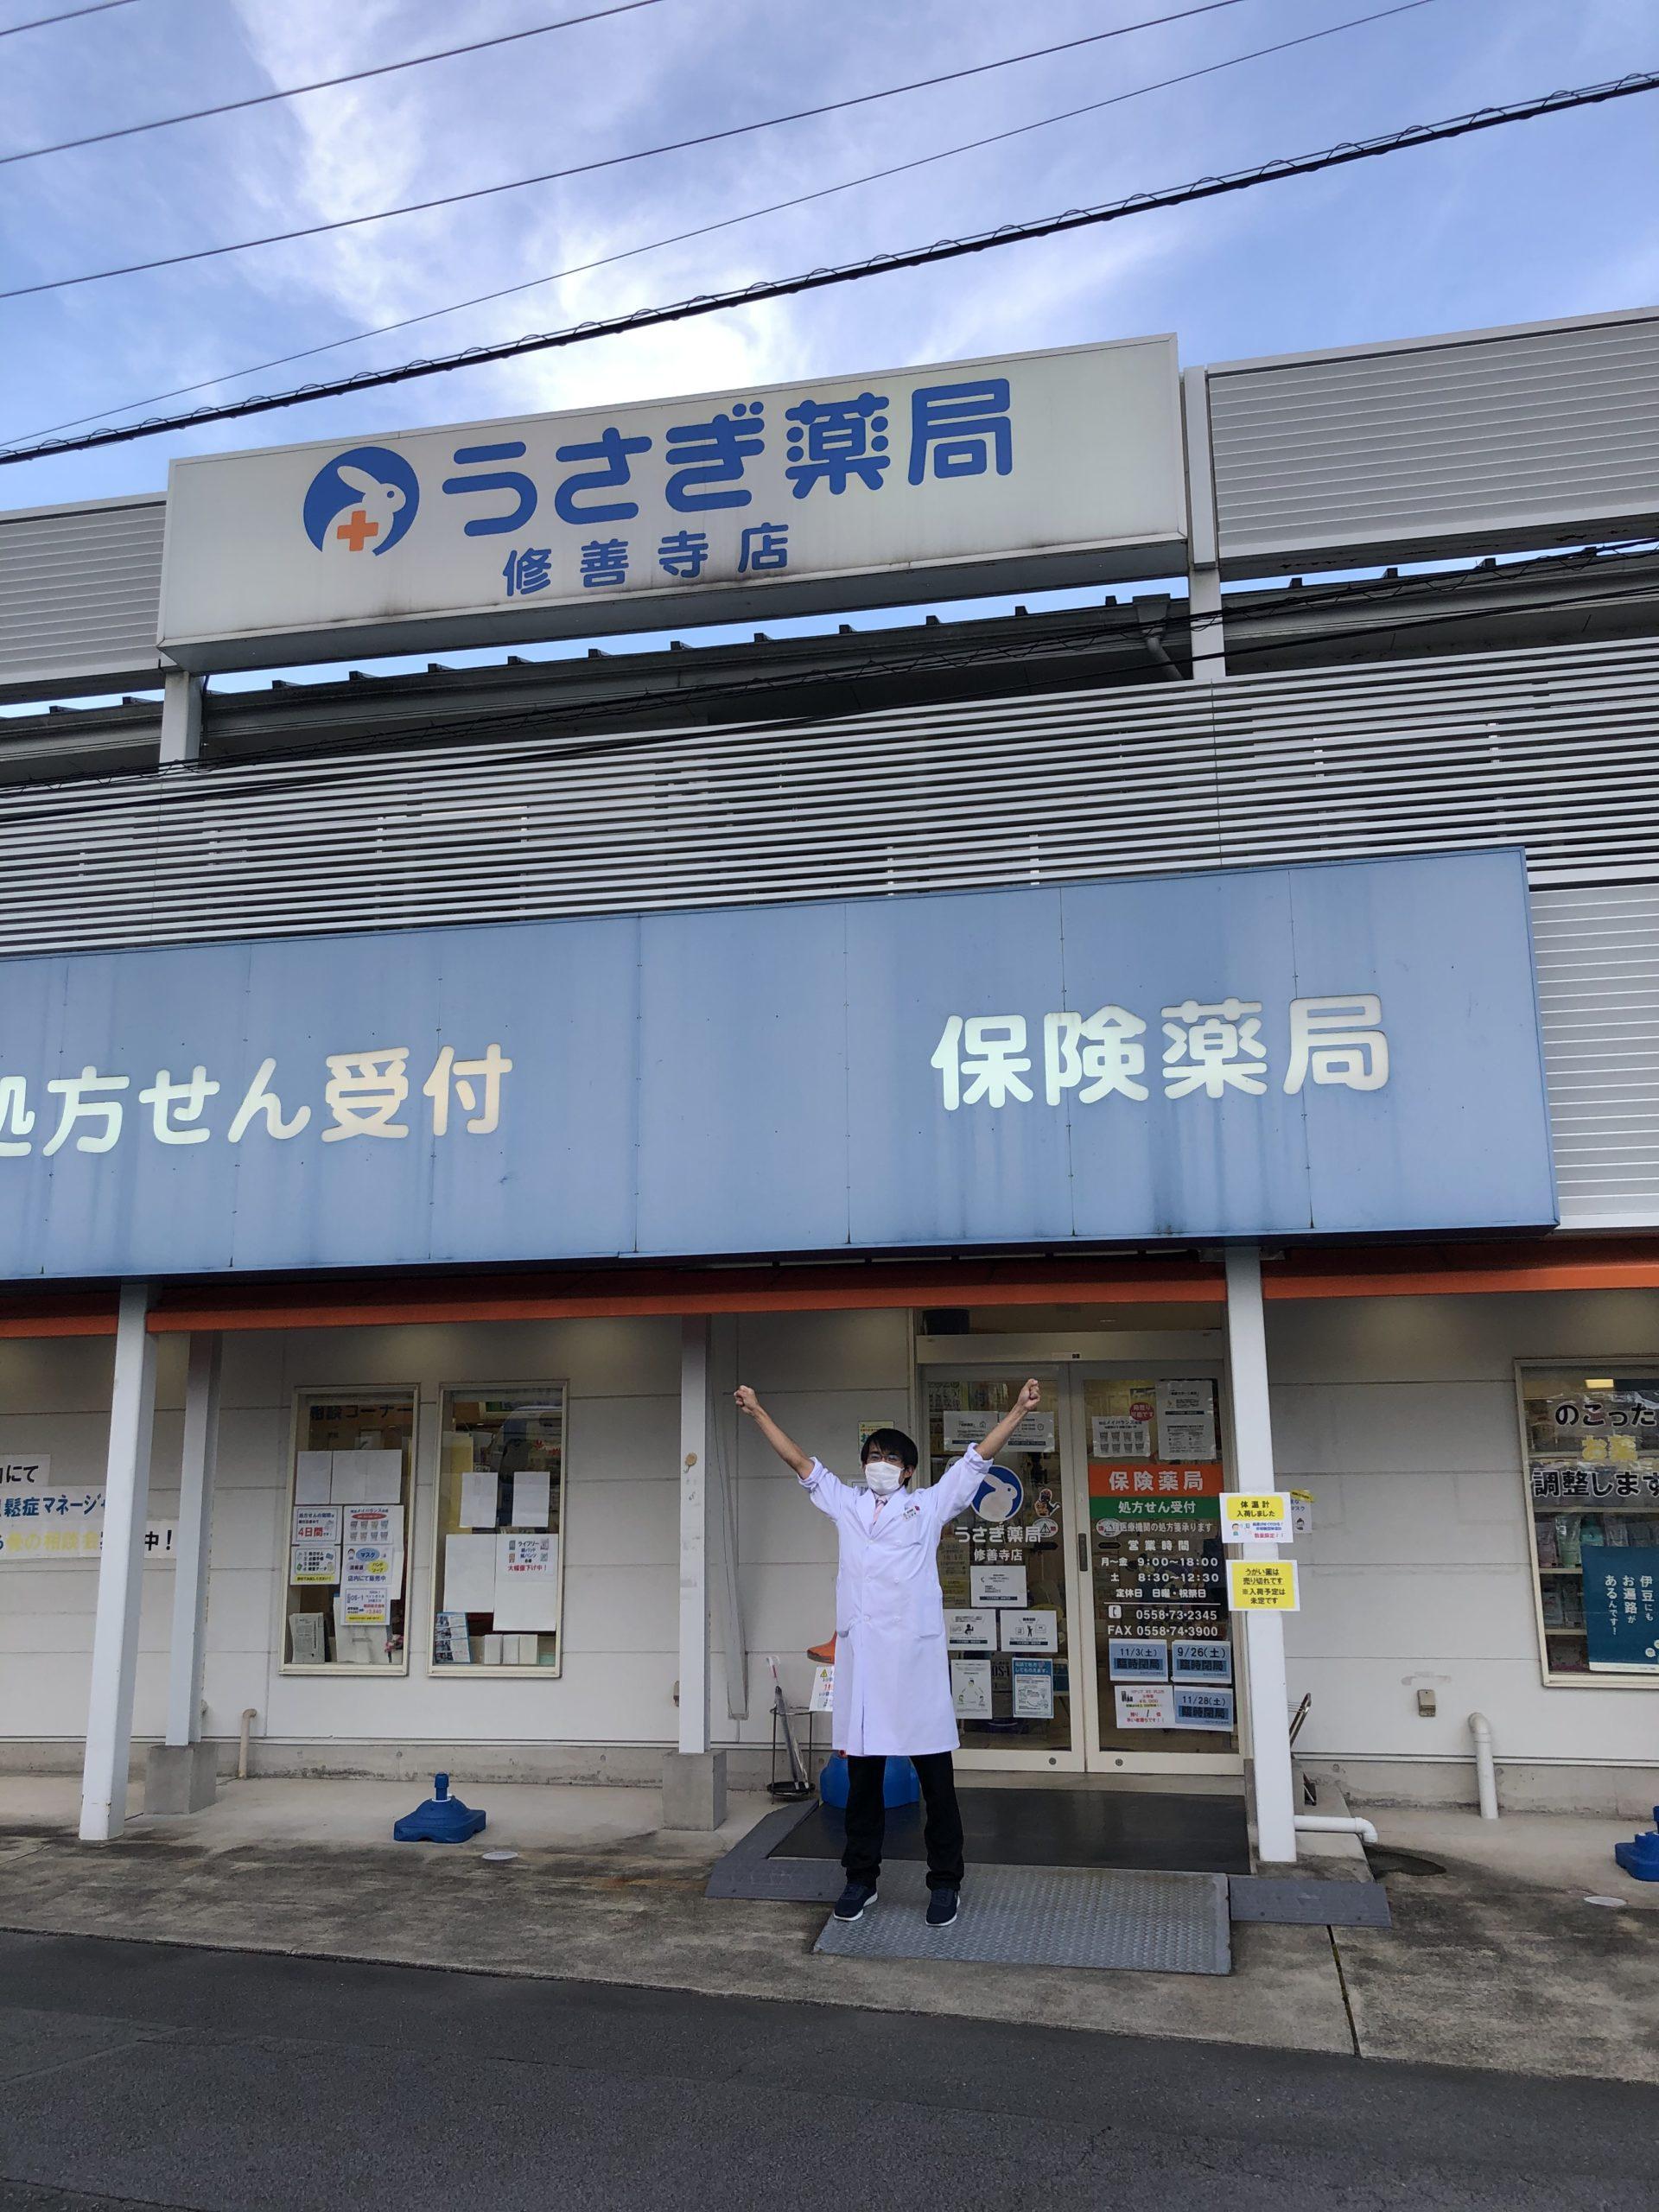 2年目薬剤師マルの徒然日誌 〜調剤薬局勤務開始!!〜